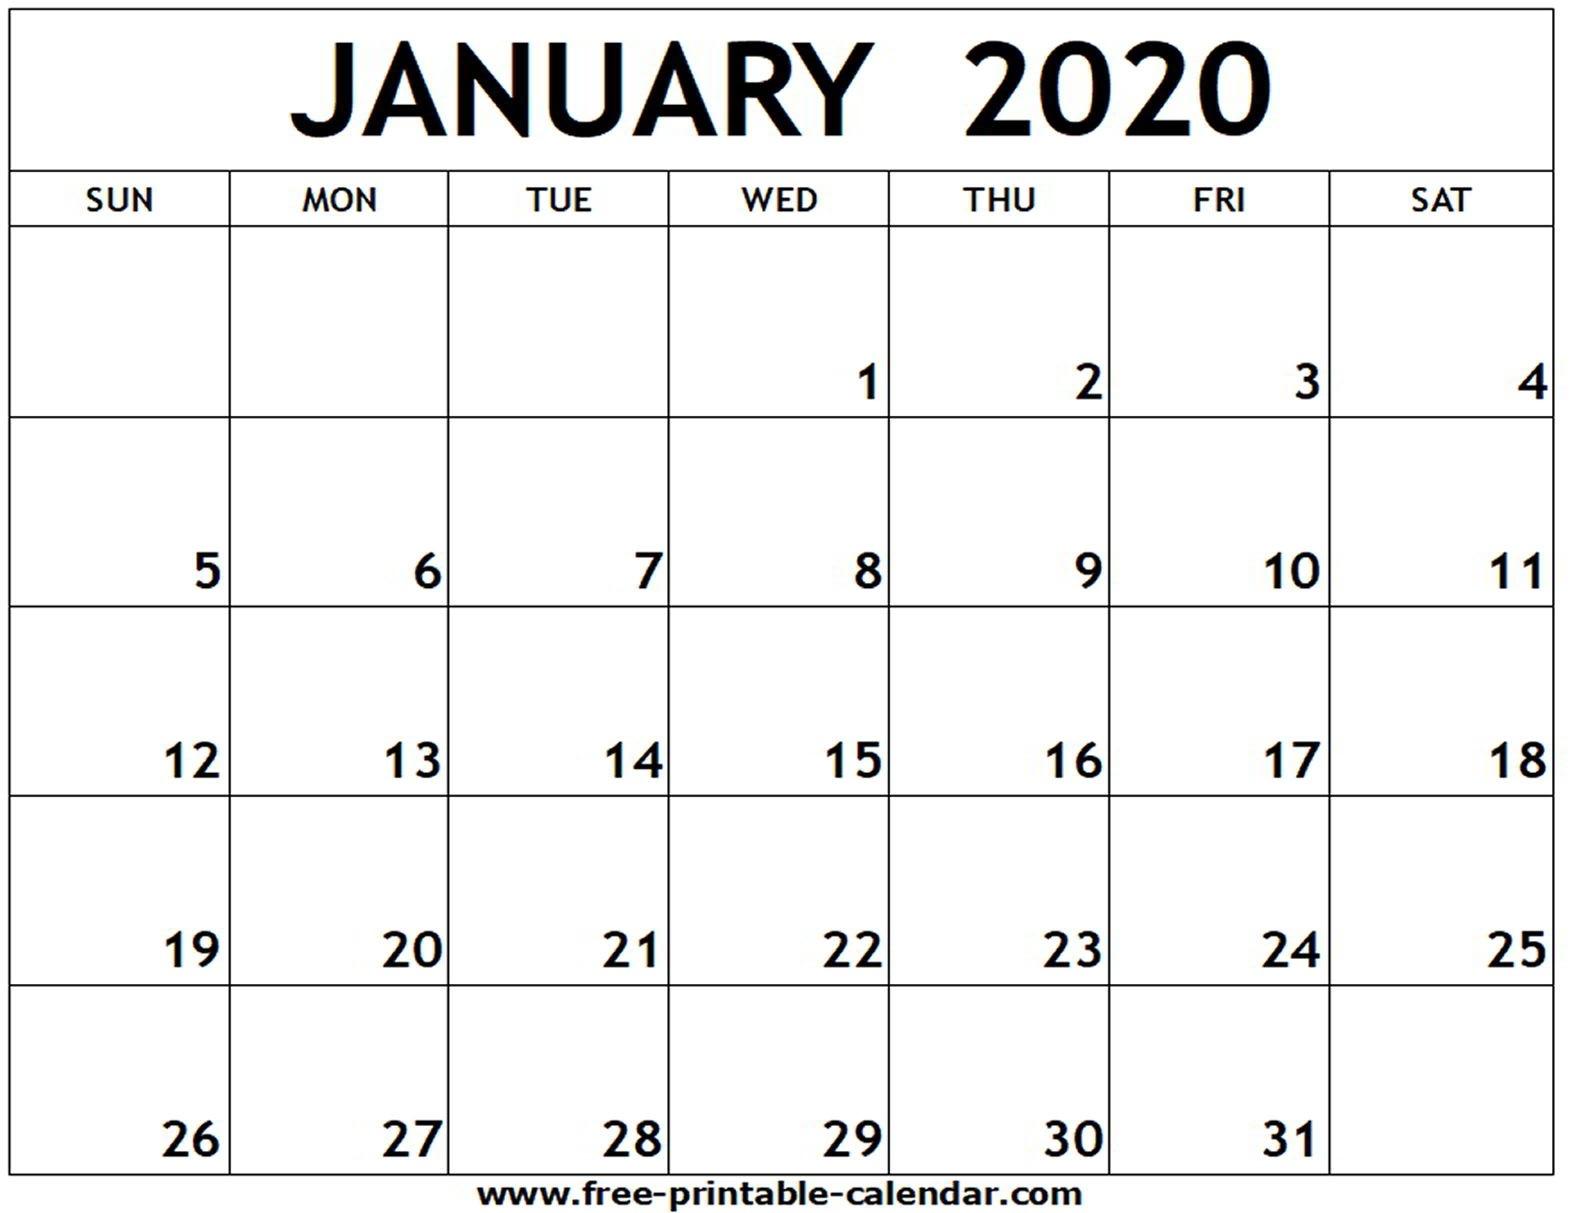 January 2020 Printable Calendar - Free-Printable-Calendar-January 2020 Calendar Of Events